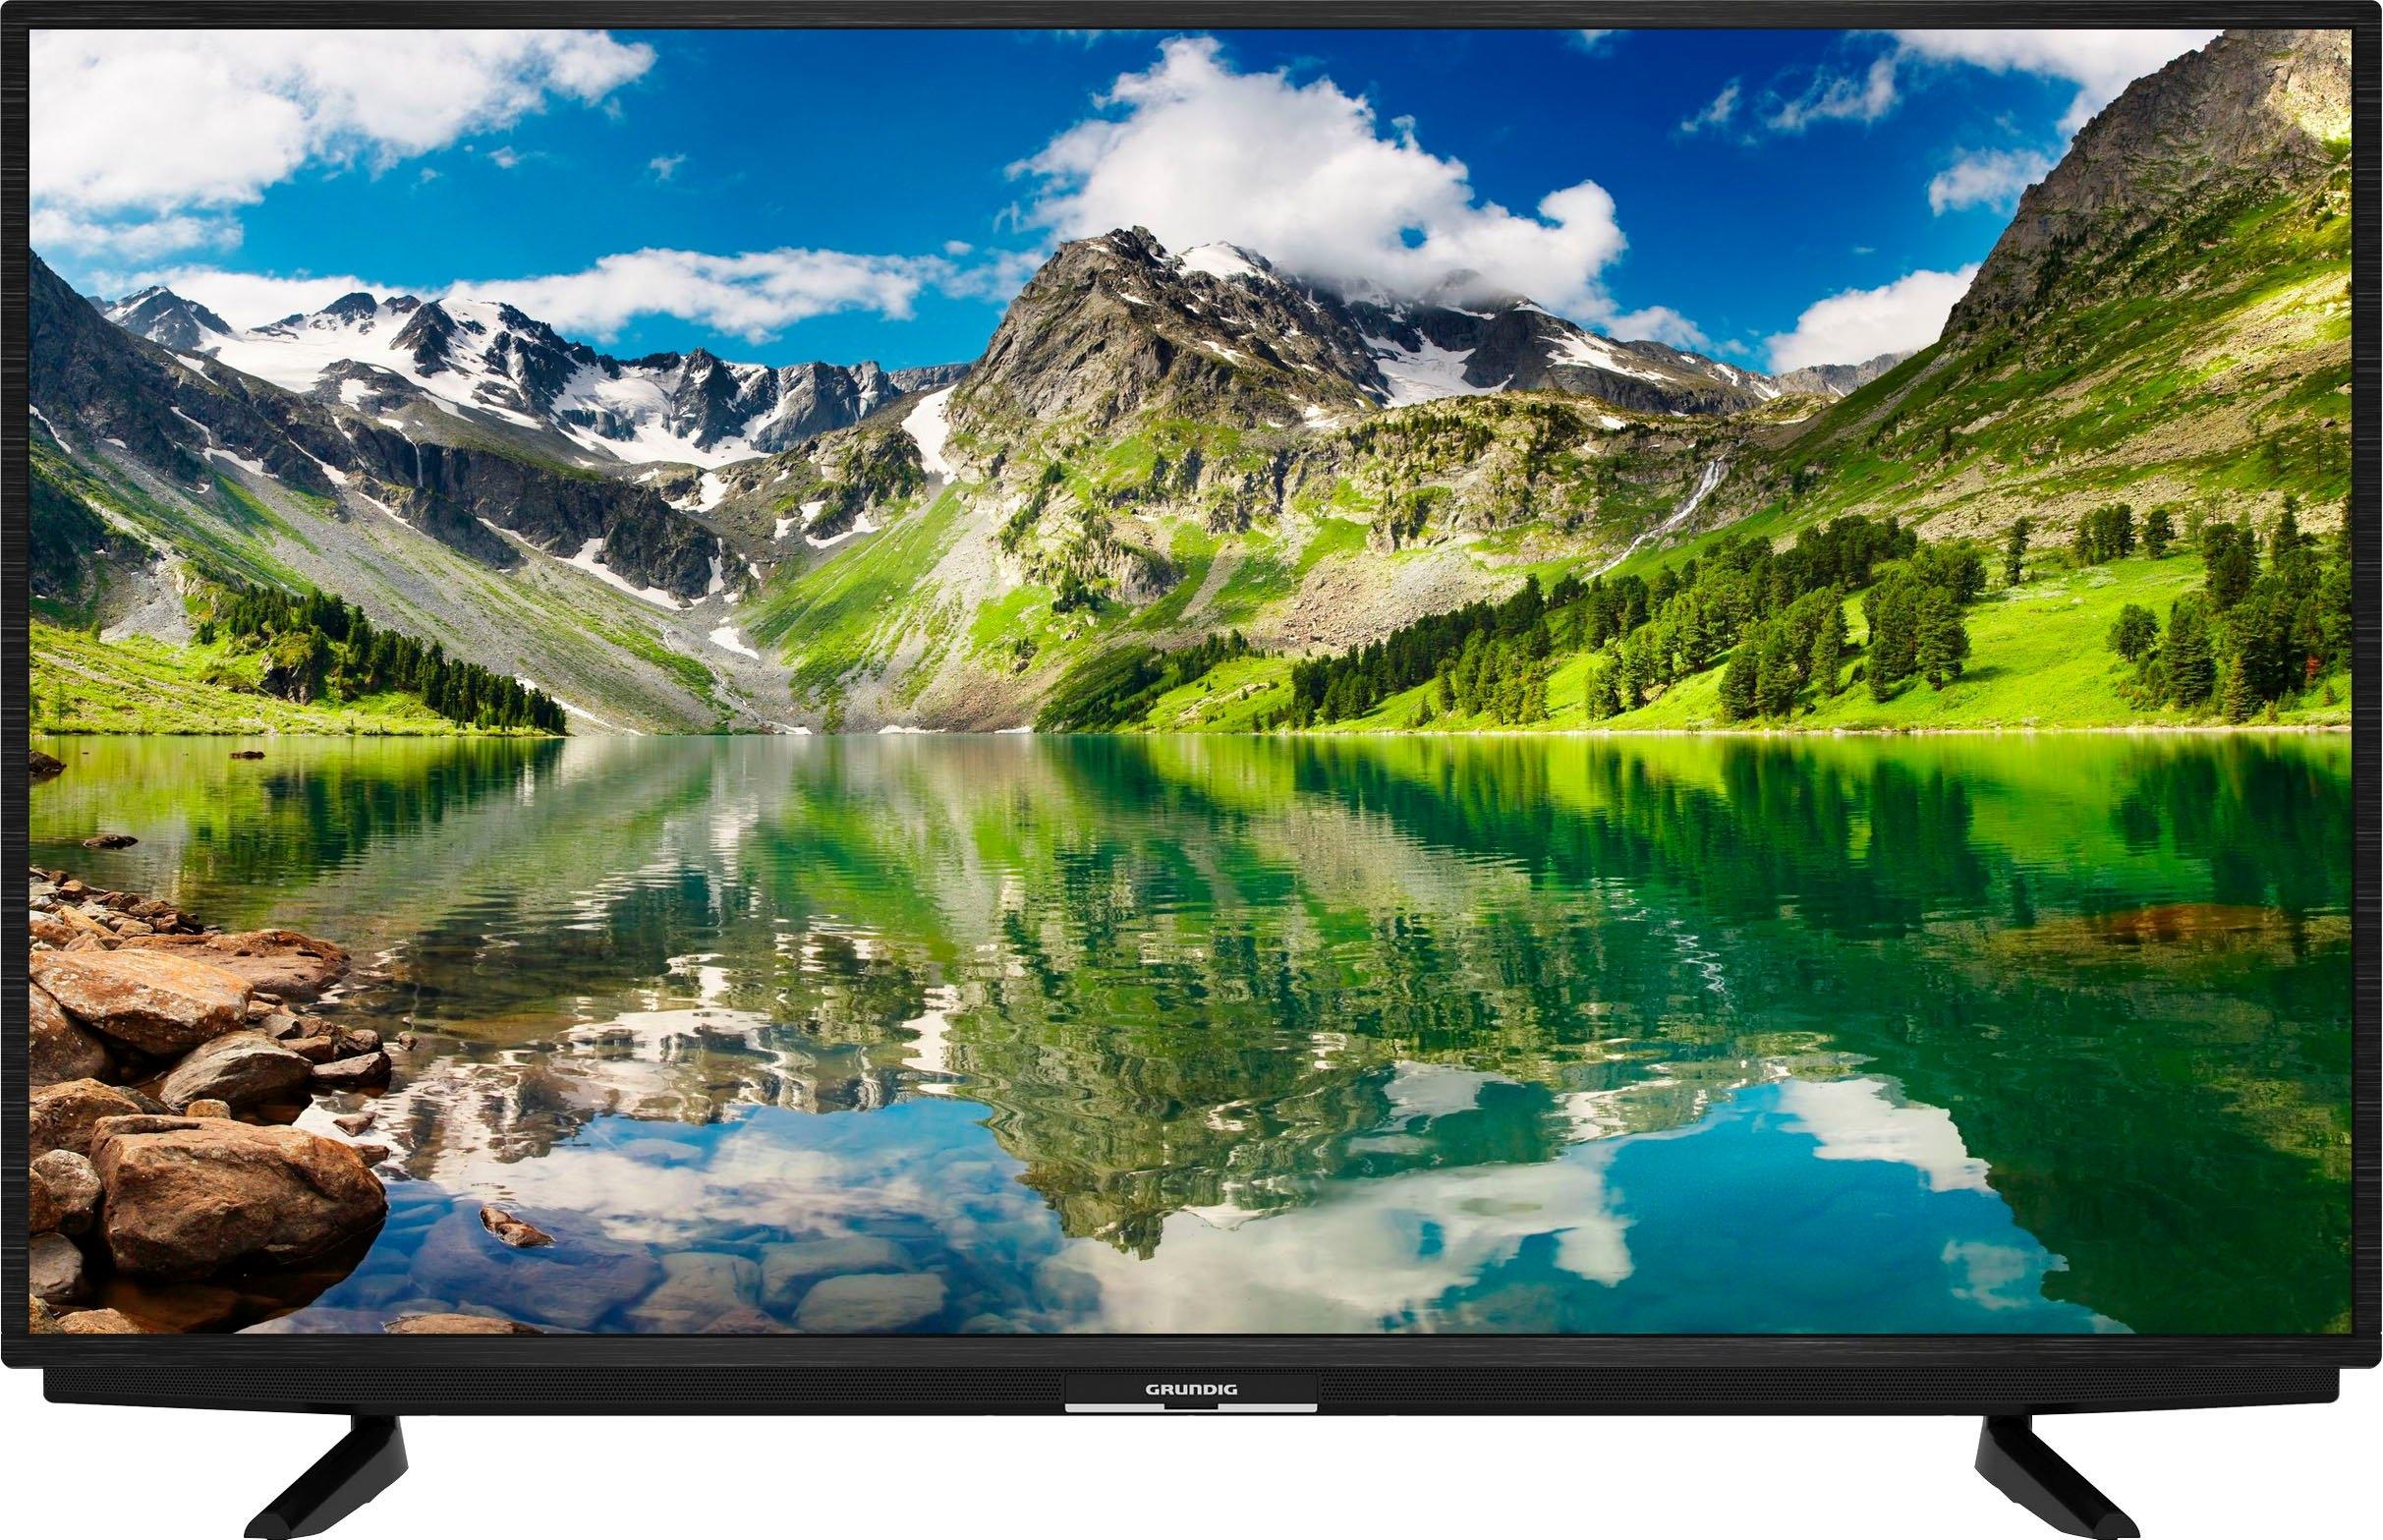 Grundig LED-TV 43 VOE 71 - Fire TV Edition TRF000, 108 cm / 43